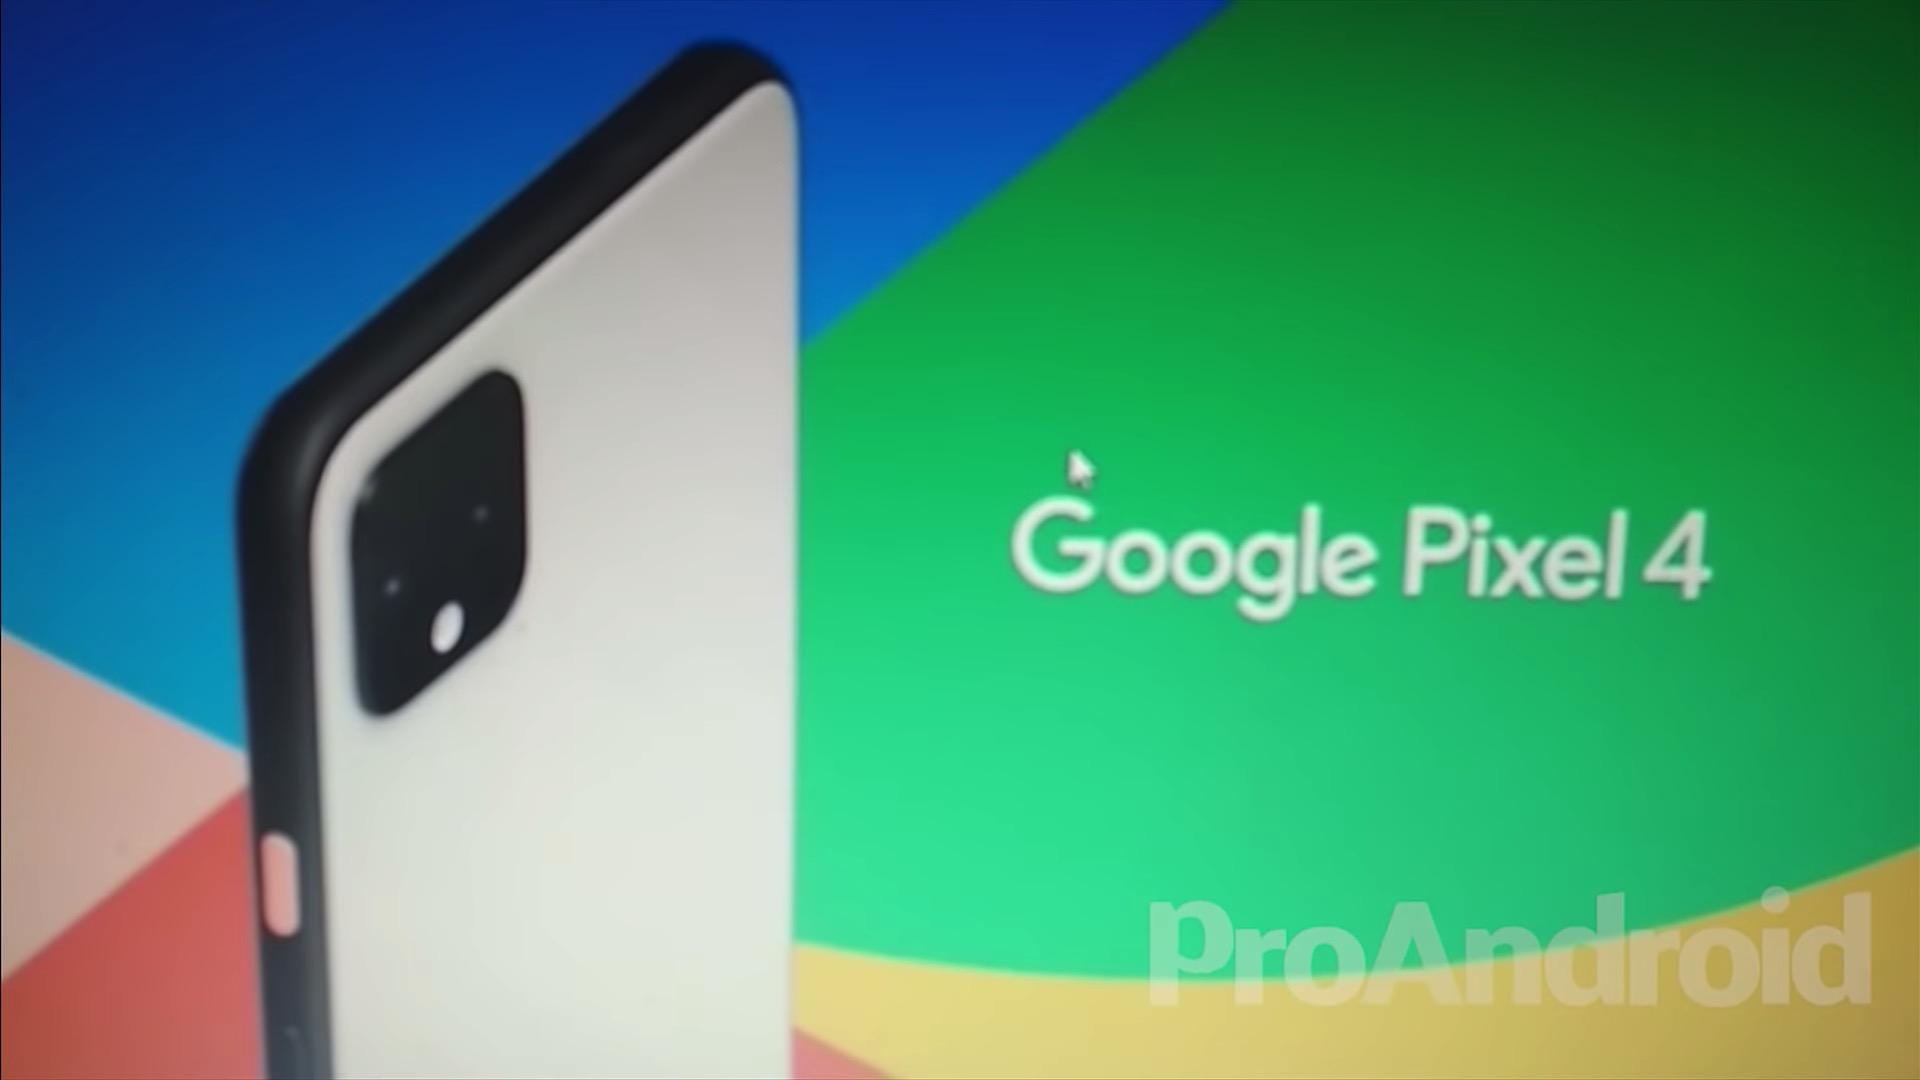 Pixel 4 promo